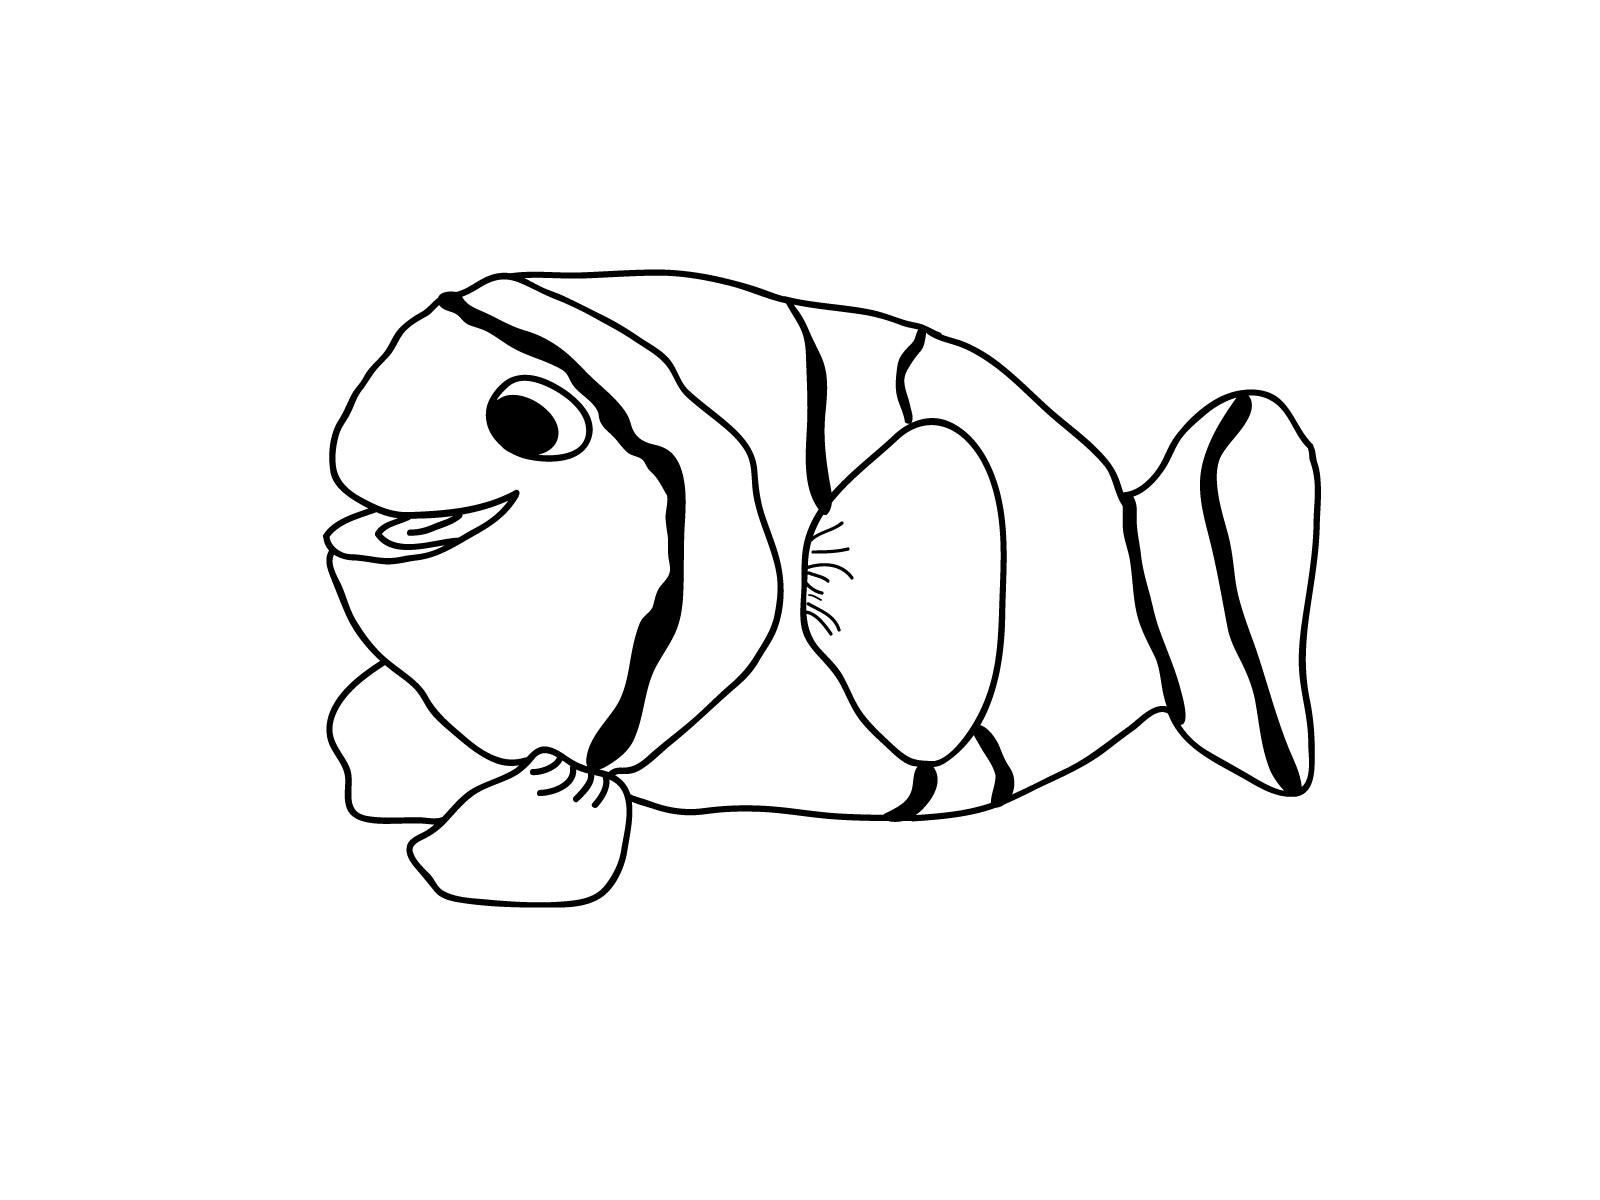 Fish Coloring Page Printable